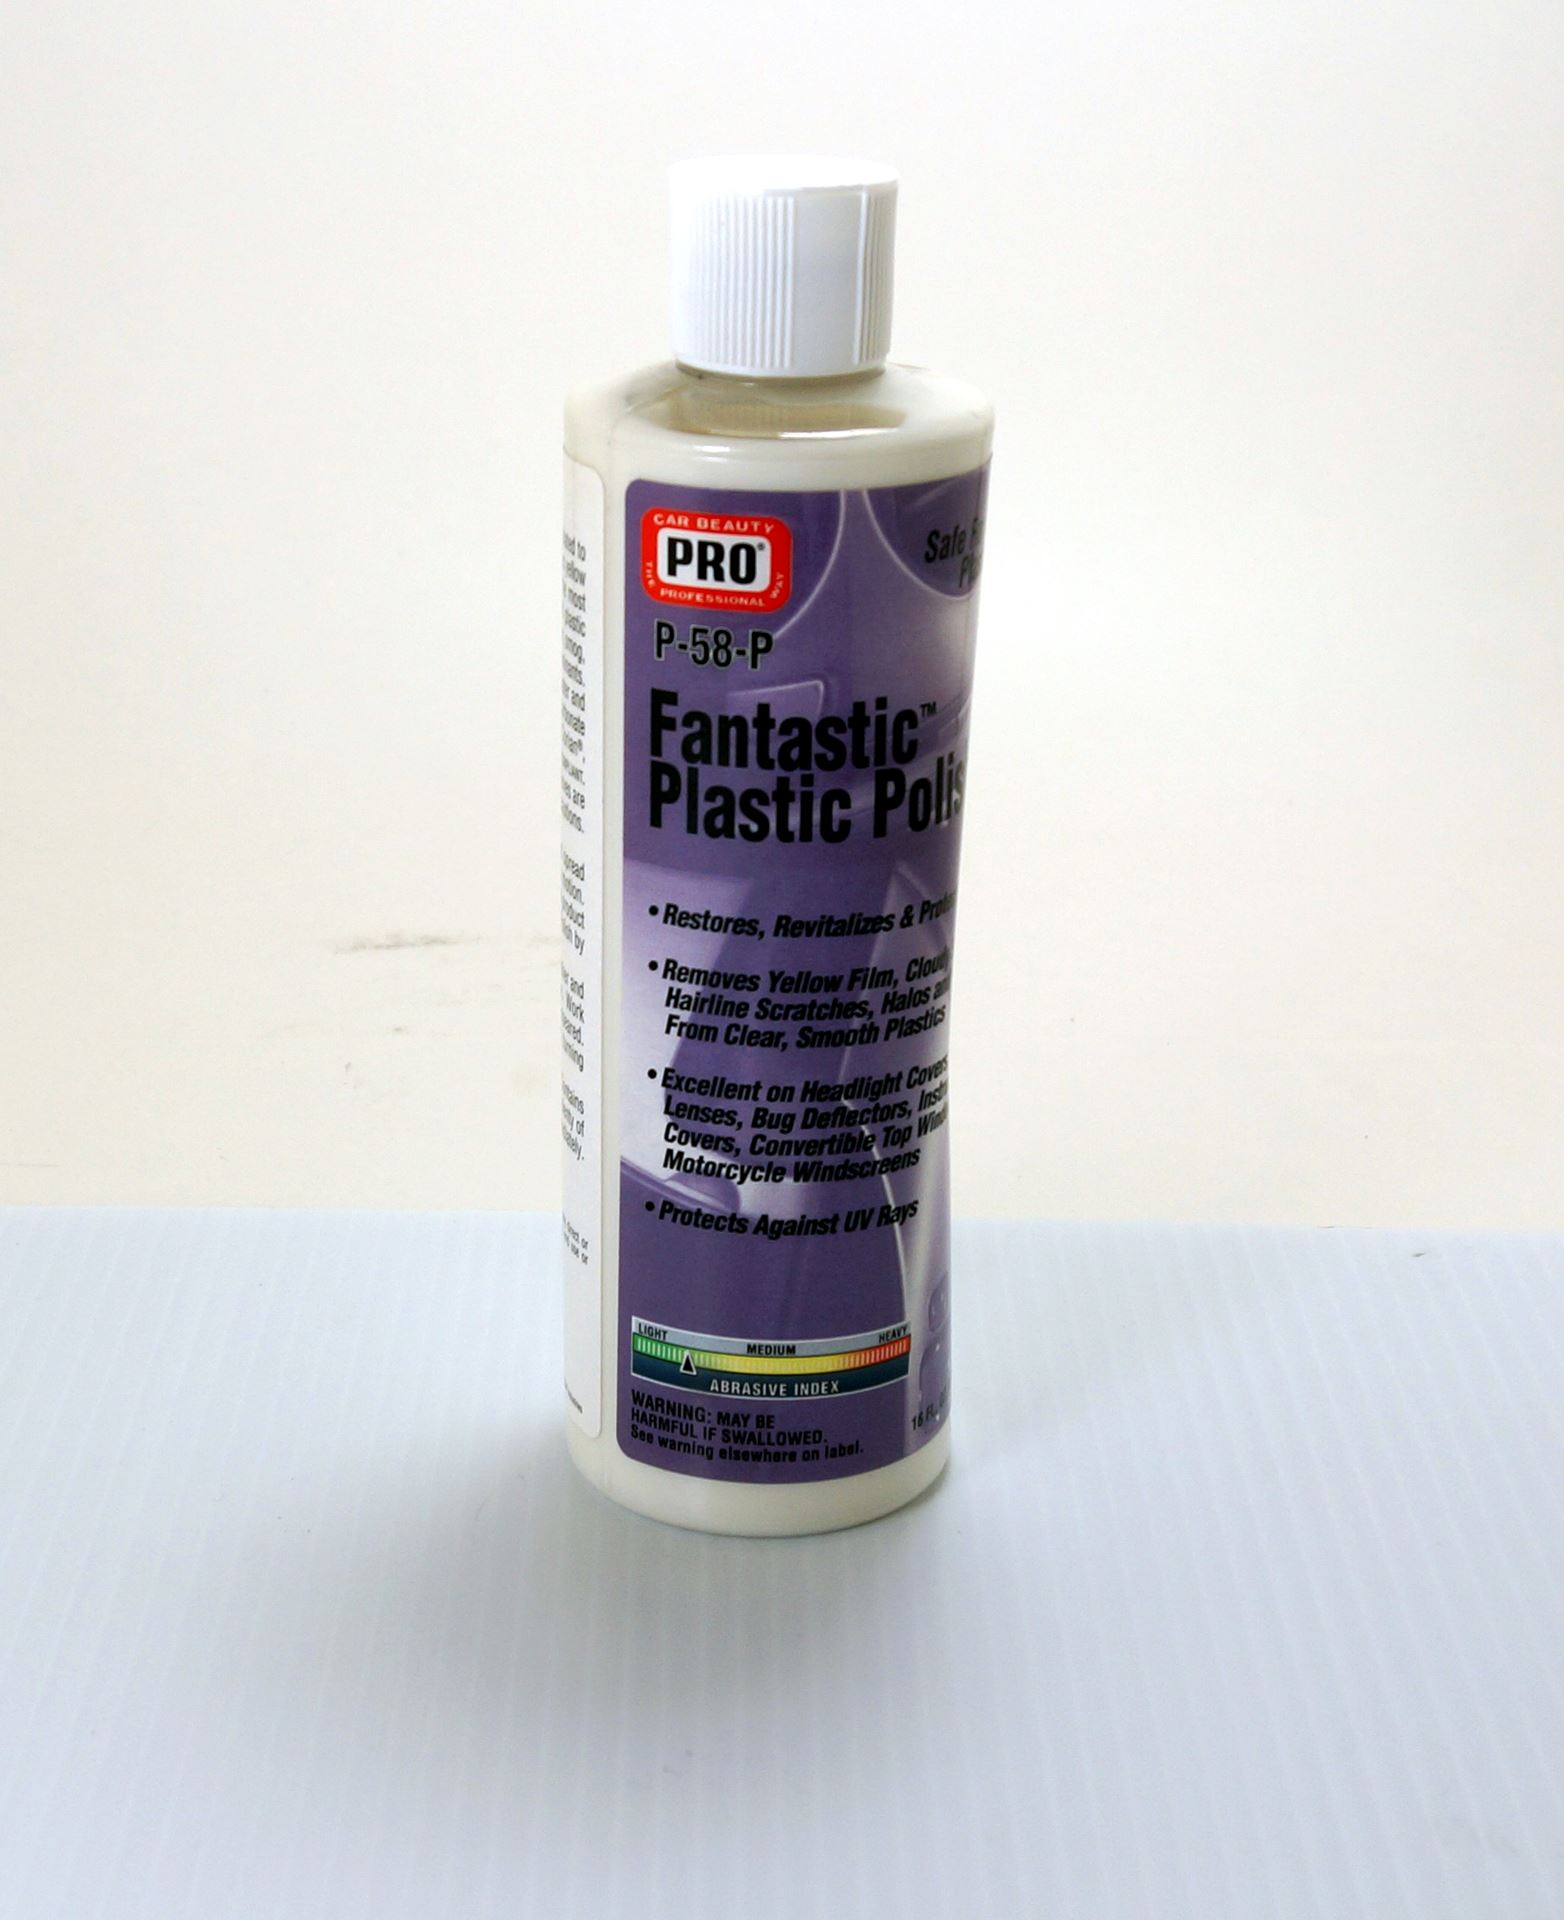 Fantastic Plastic Polish P58p Professional Detailing